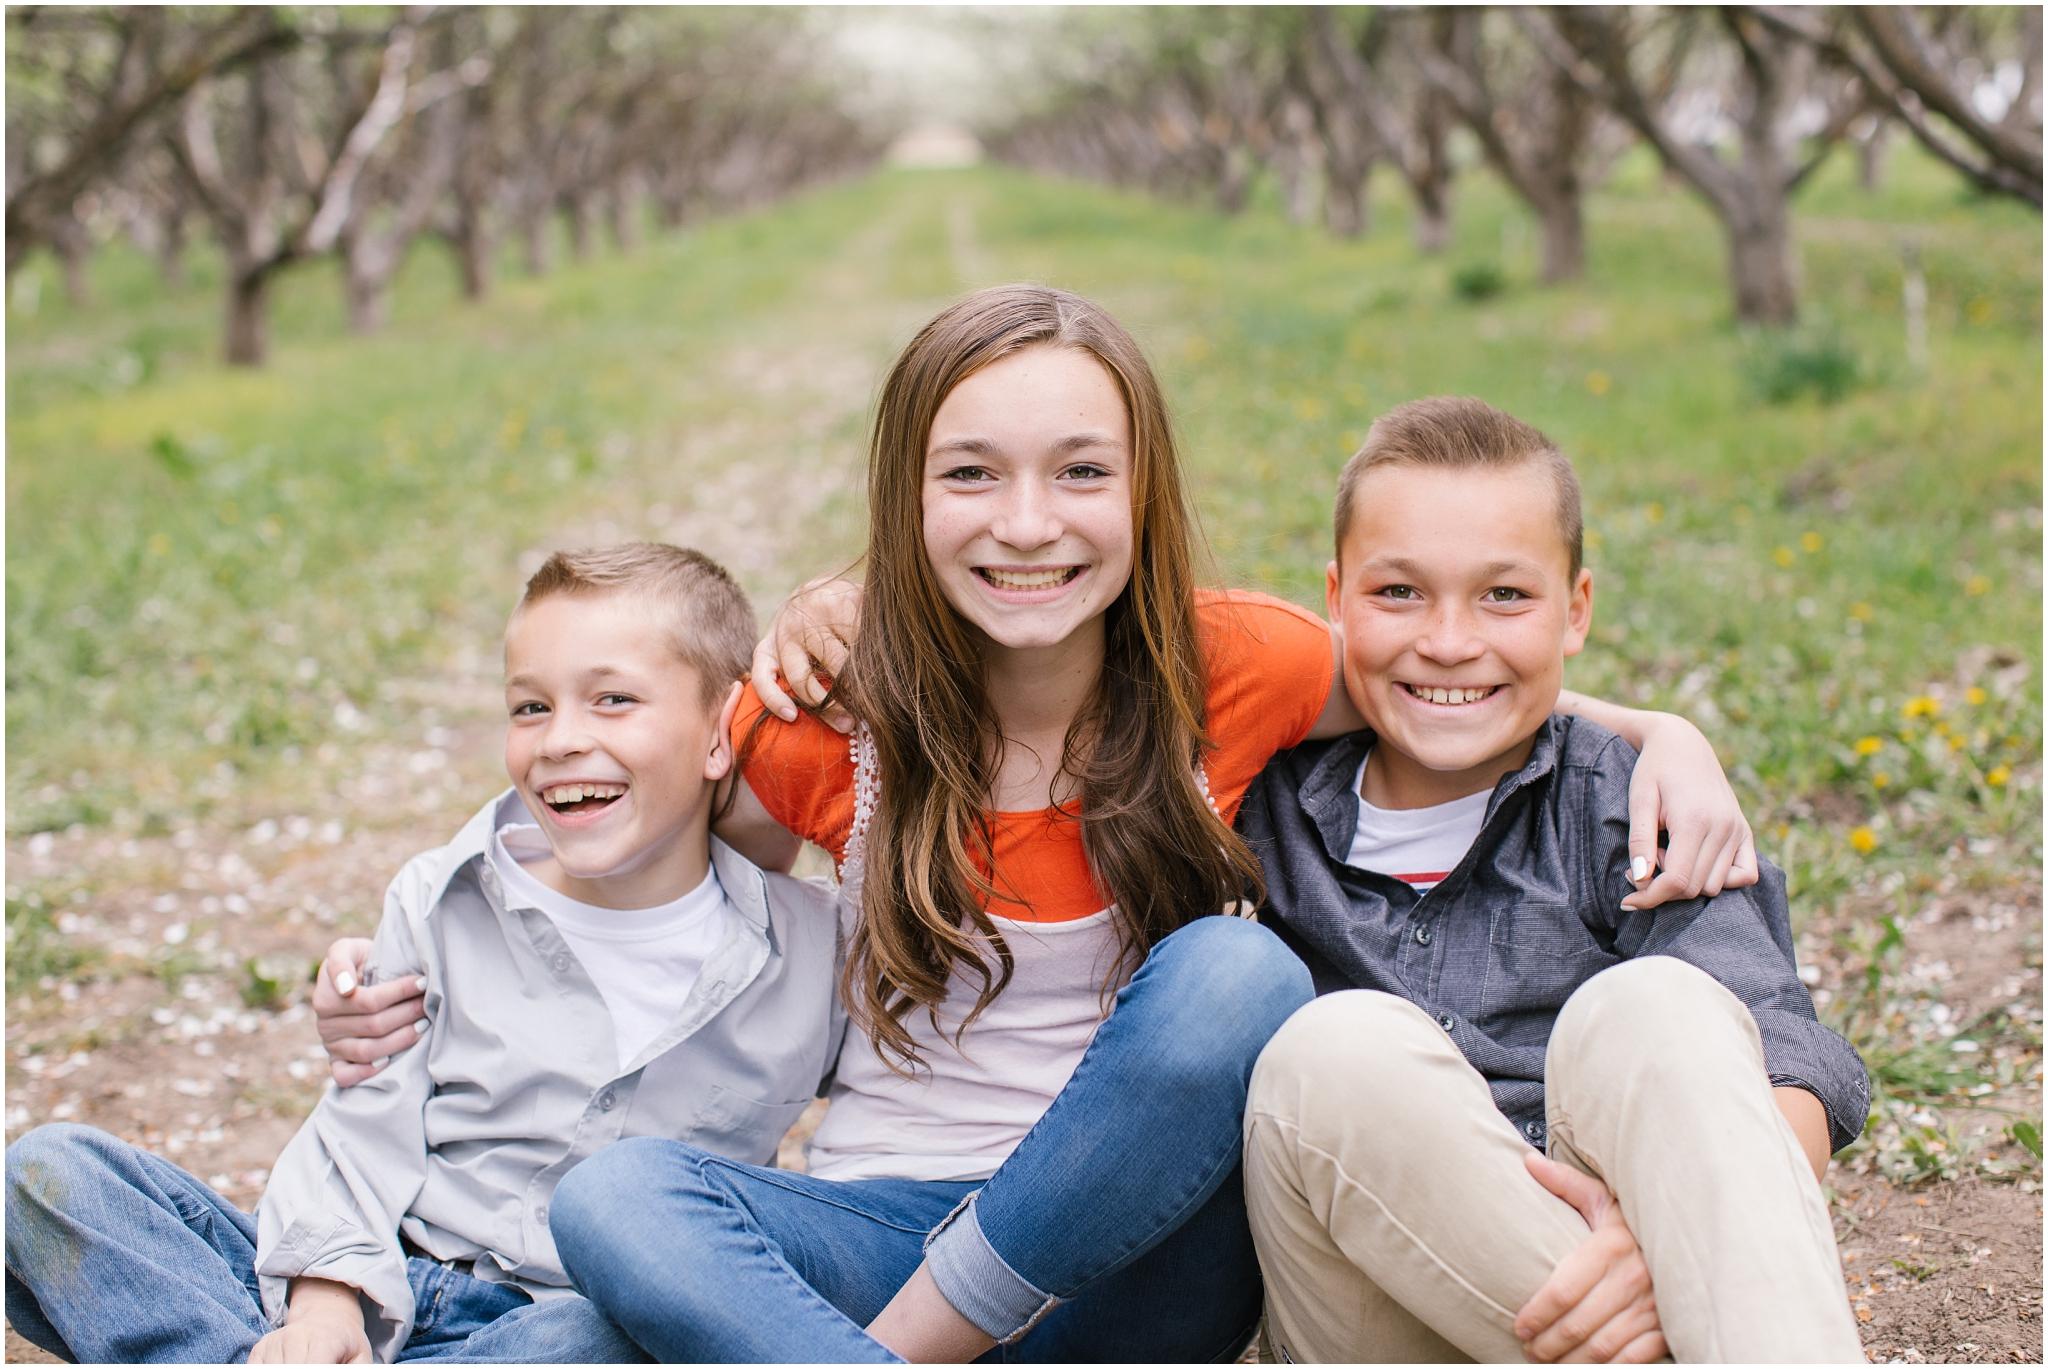 Millar-130_Lizzie-B-Imagery-Utah-Family-Photographer-Salt-Lake-City-Park-City-utah-state-hospital.jpg